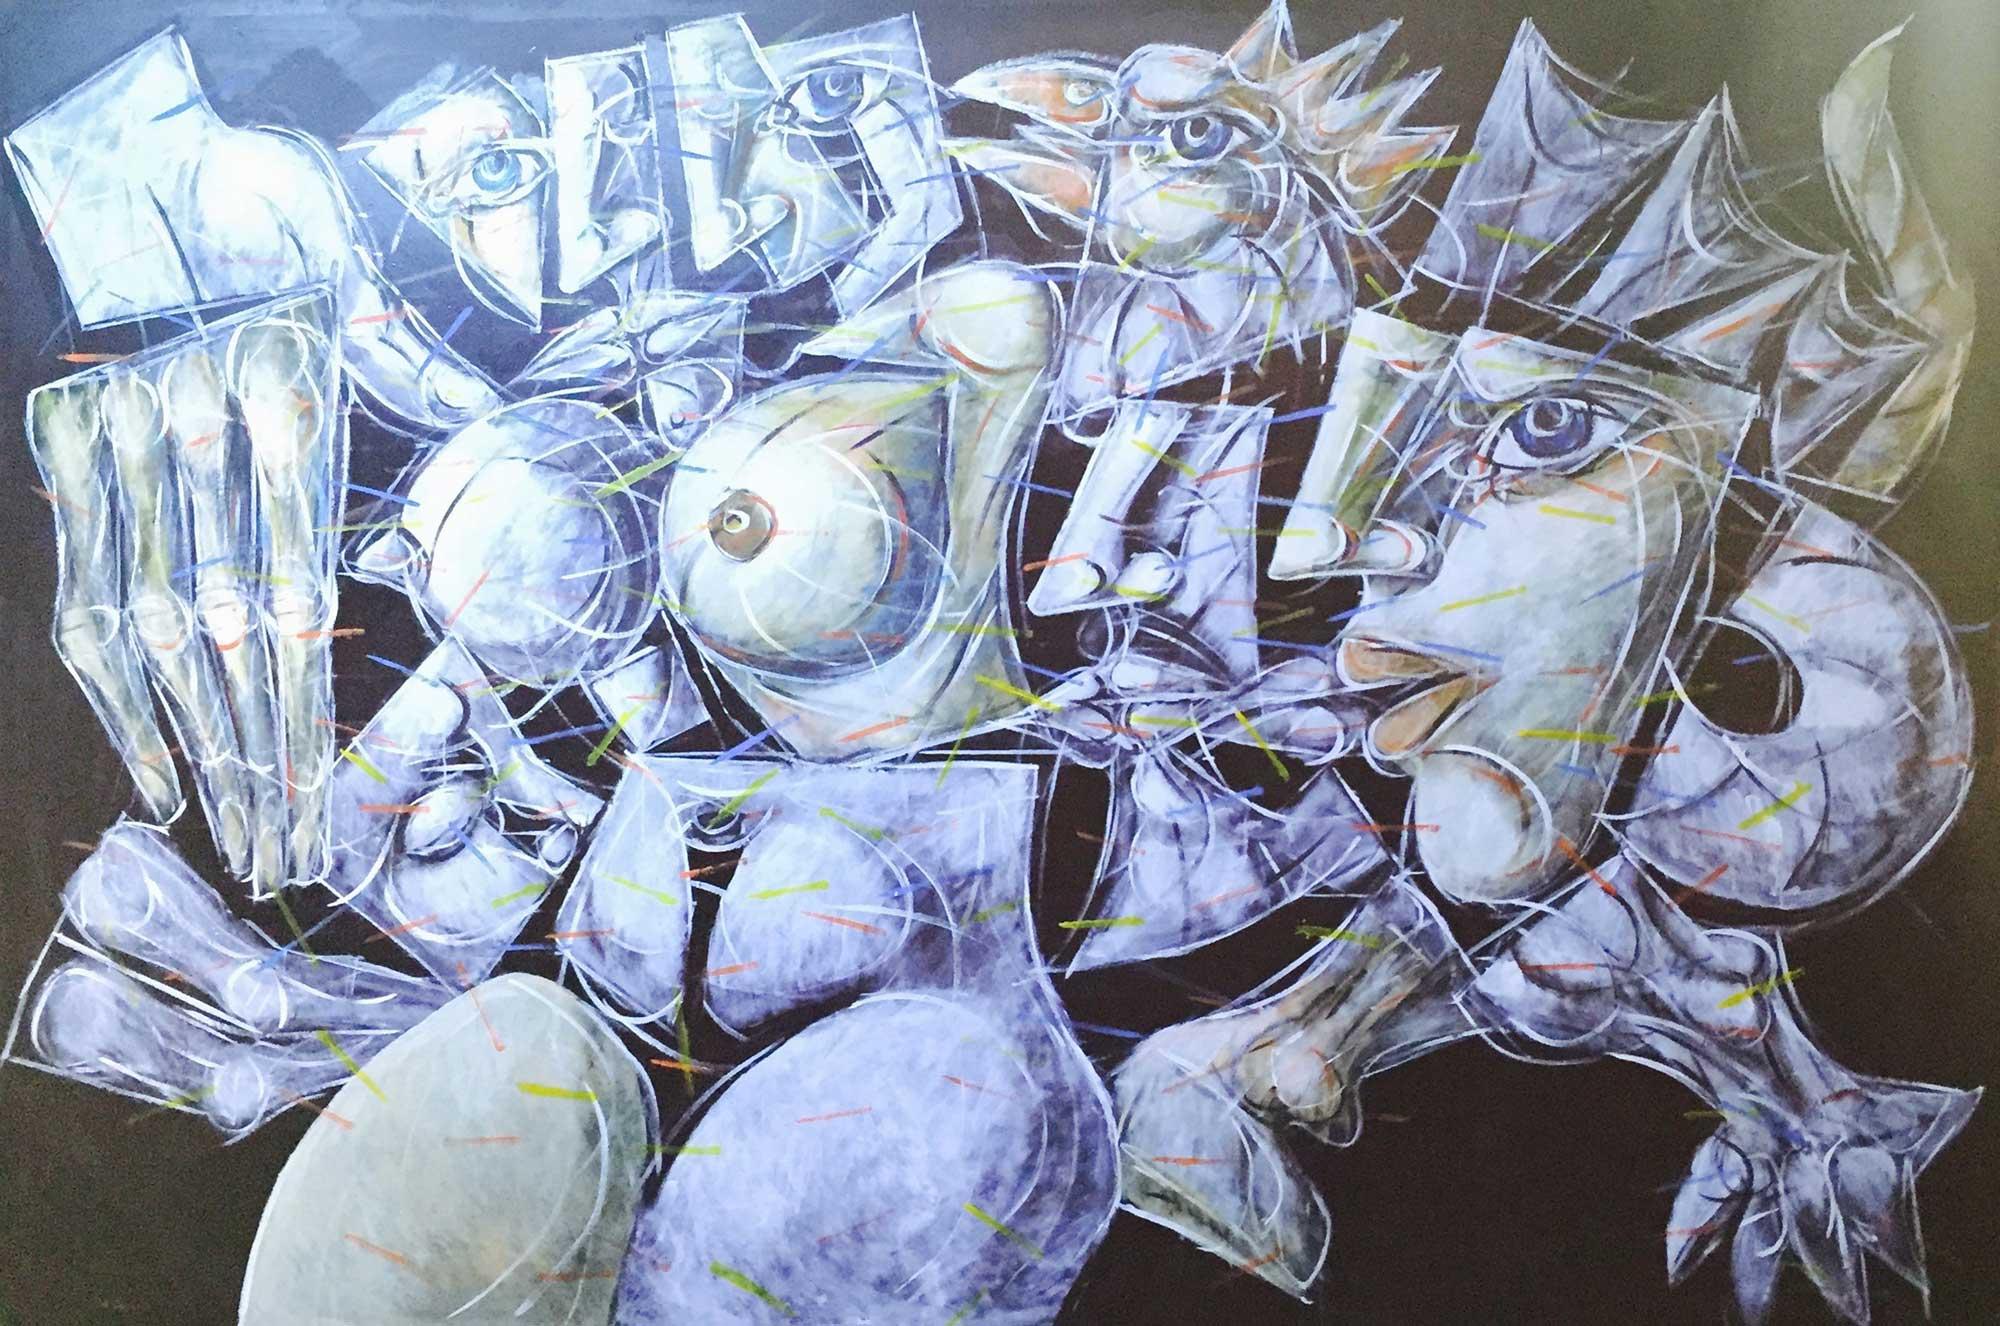 Venceslav ANTONOV, Composition III, 2015, acrylic on canvas, 195x 285 cm